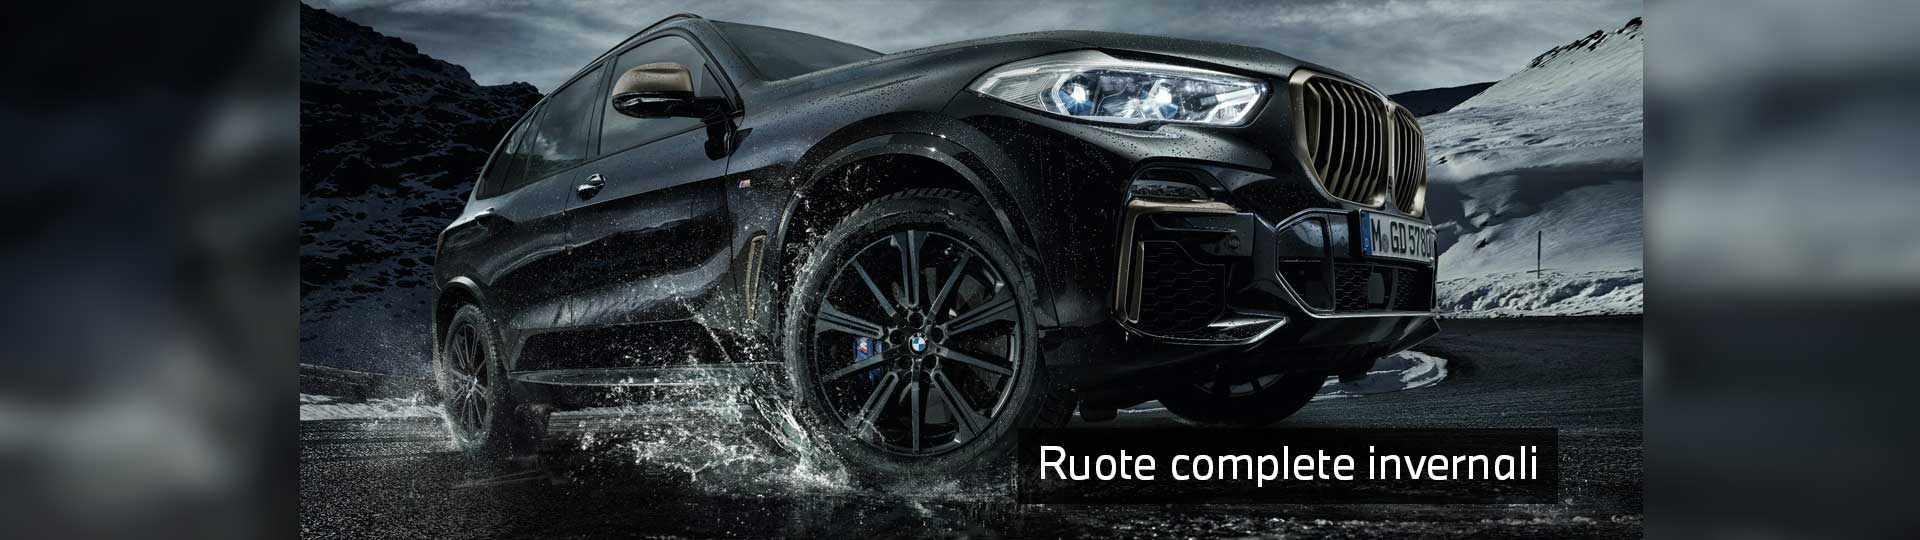 BMW_promo-ruote-invernali-min.jpg